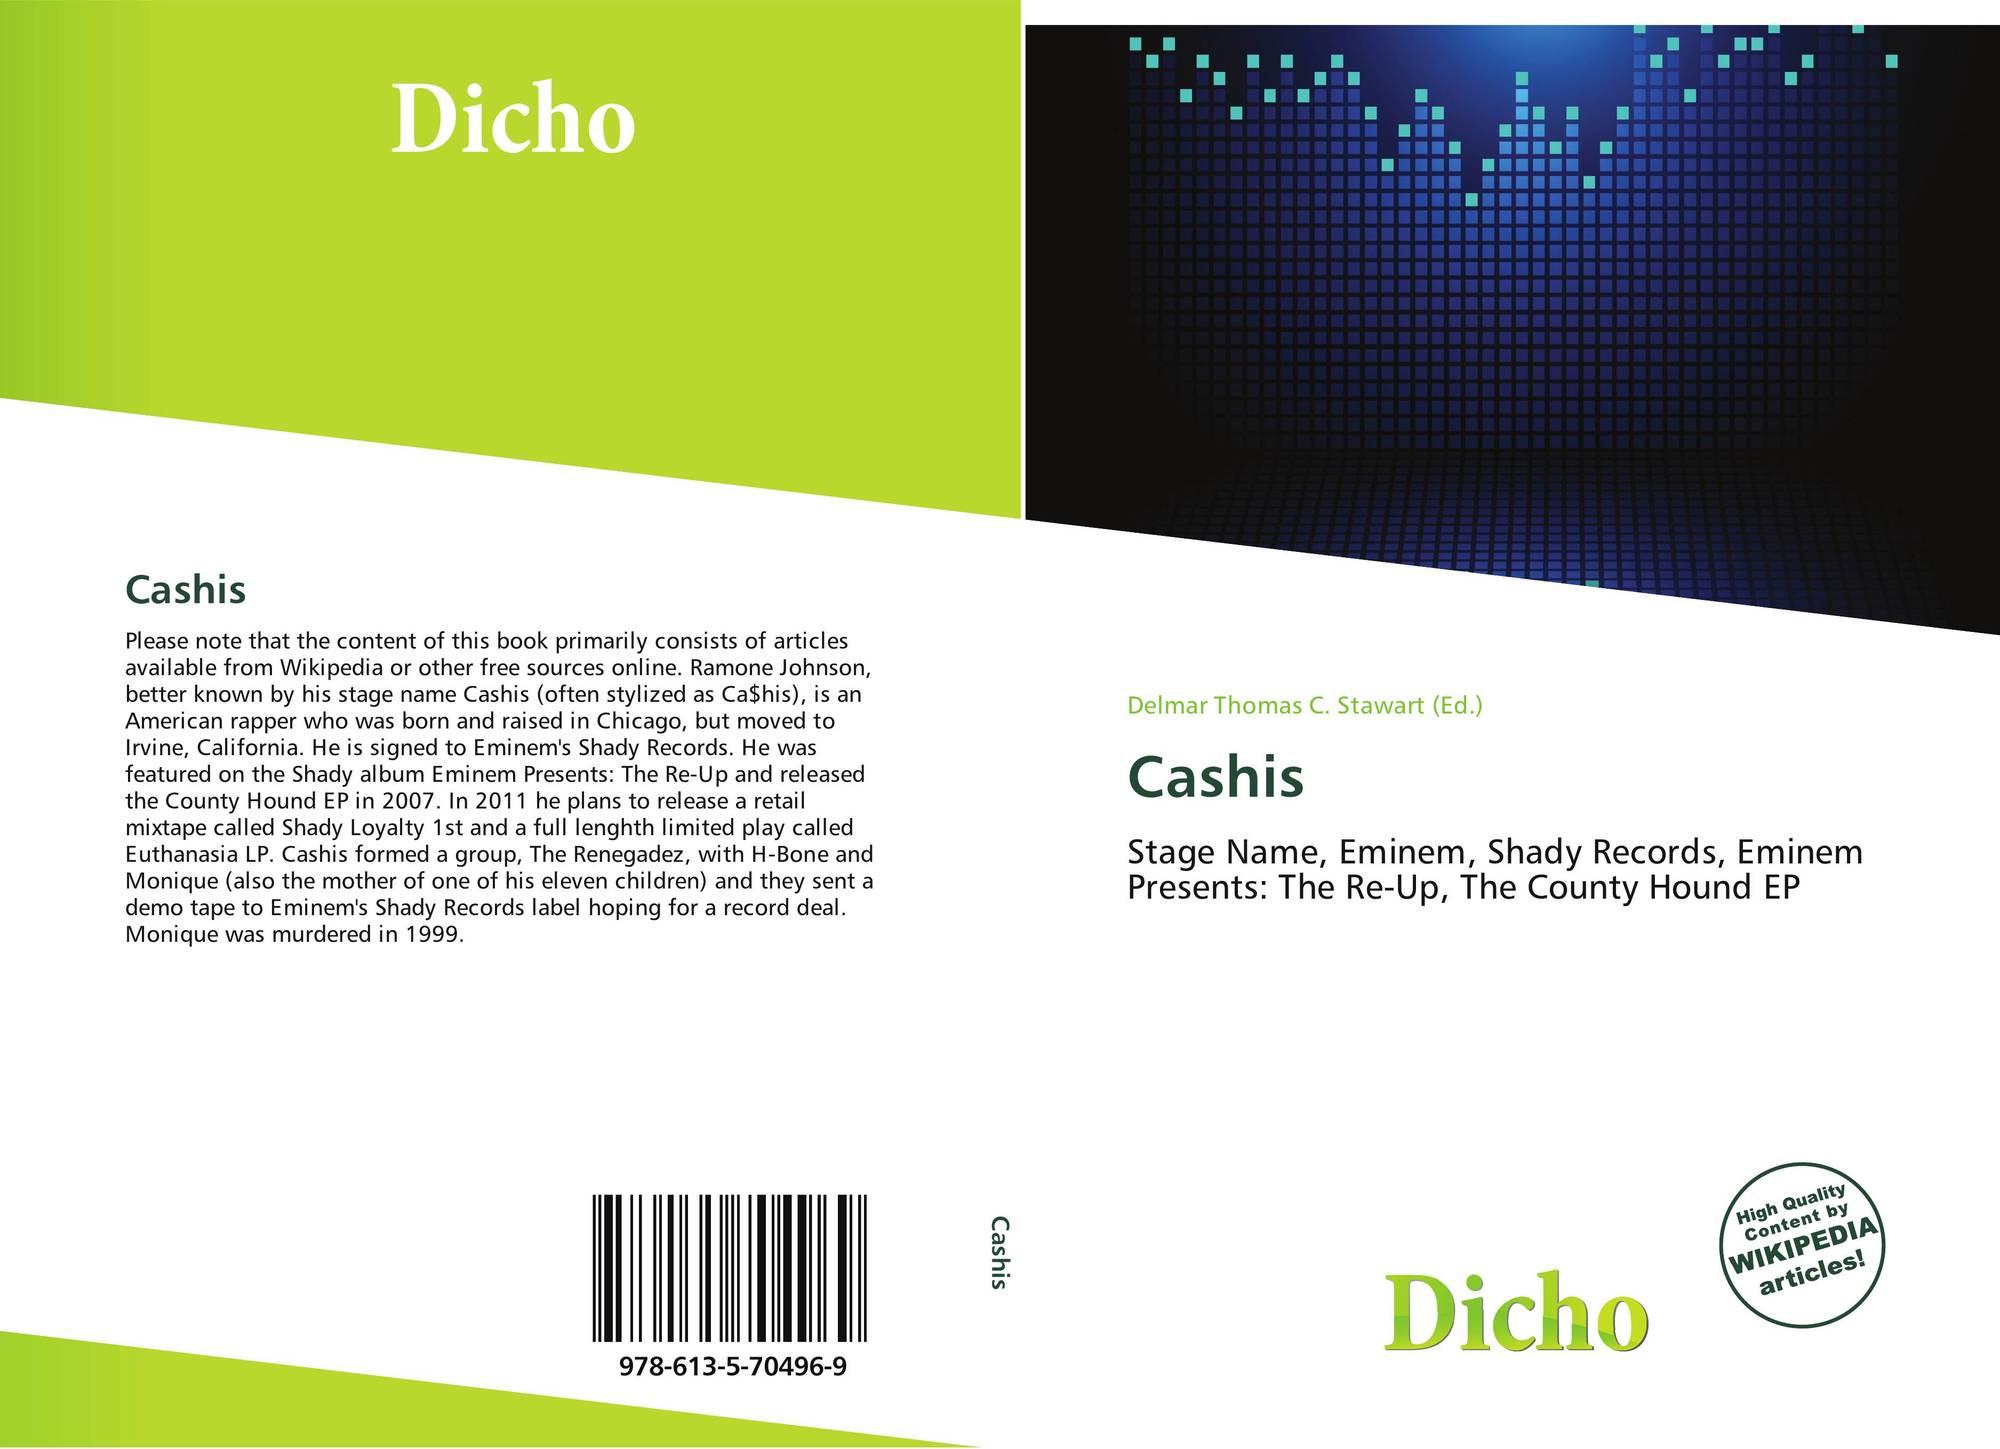 Cashis, 978-613-5-70496-9, 6135704966 ,9786135704969